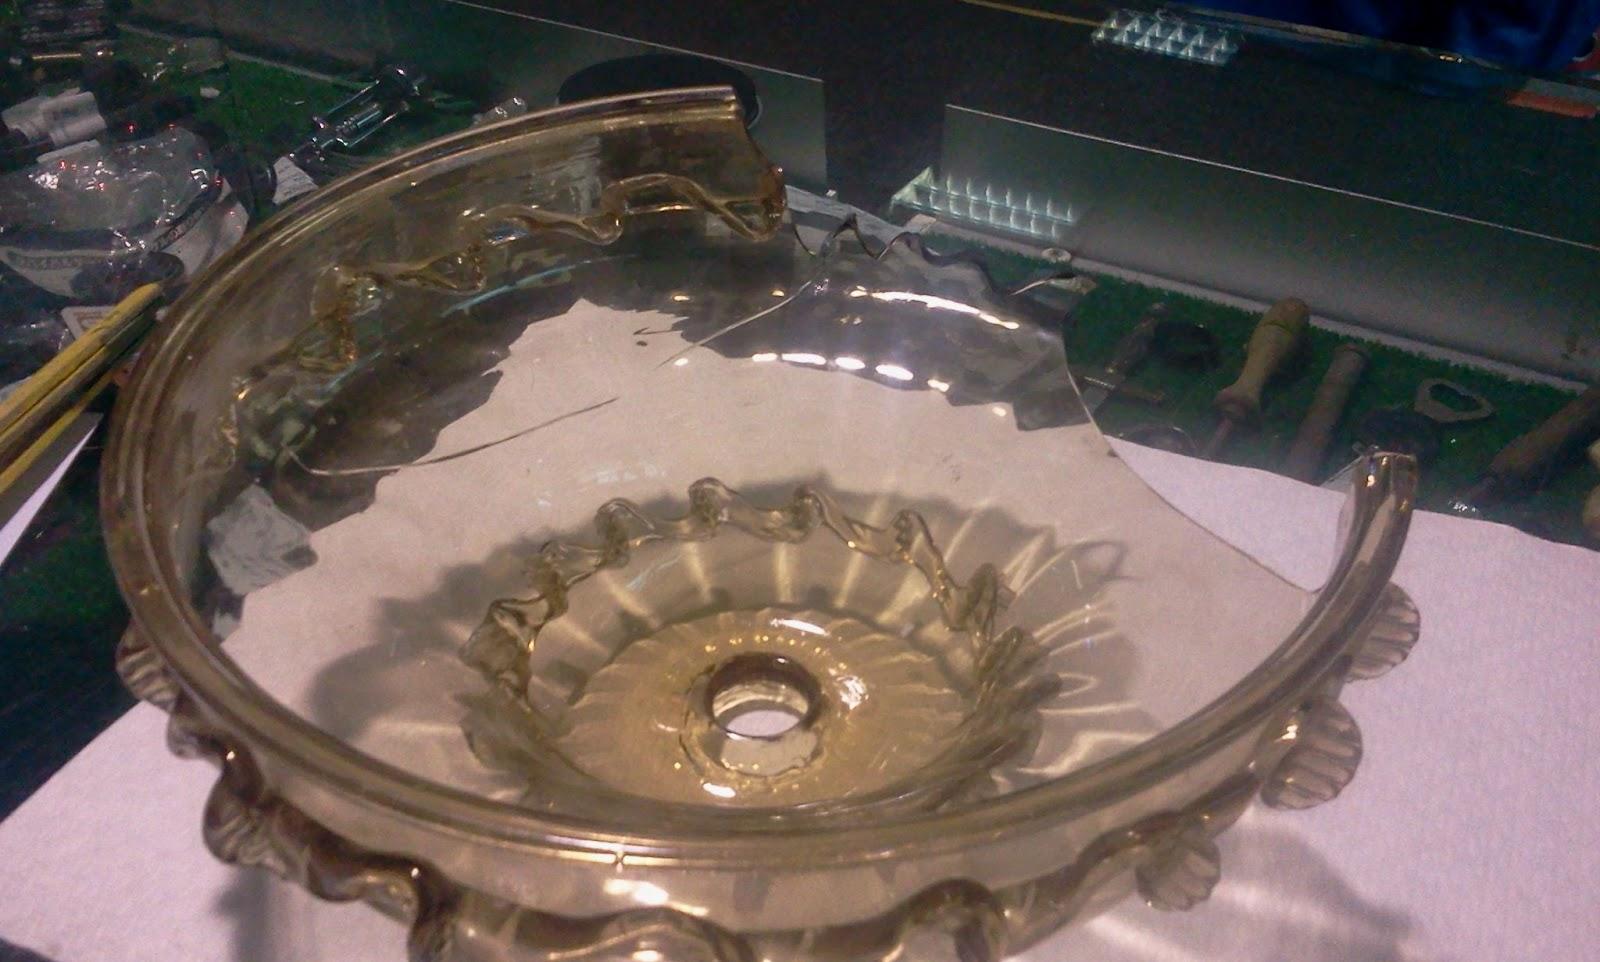 ricambi lampadari murano : Ricambi per lampadari in vetro di Murano: Fondino, pezzi di ricambio ...